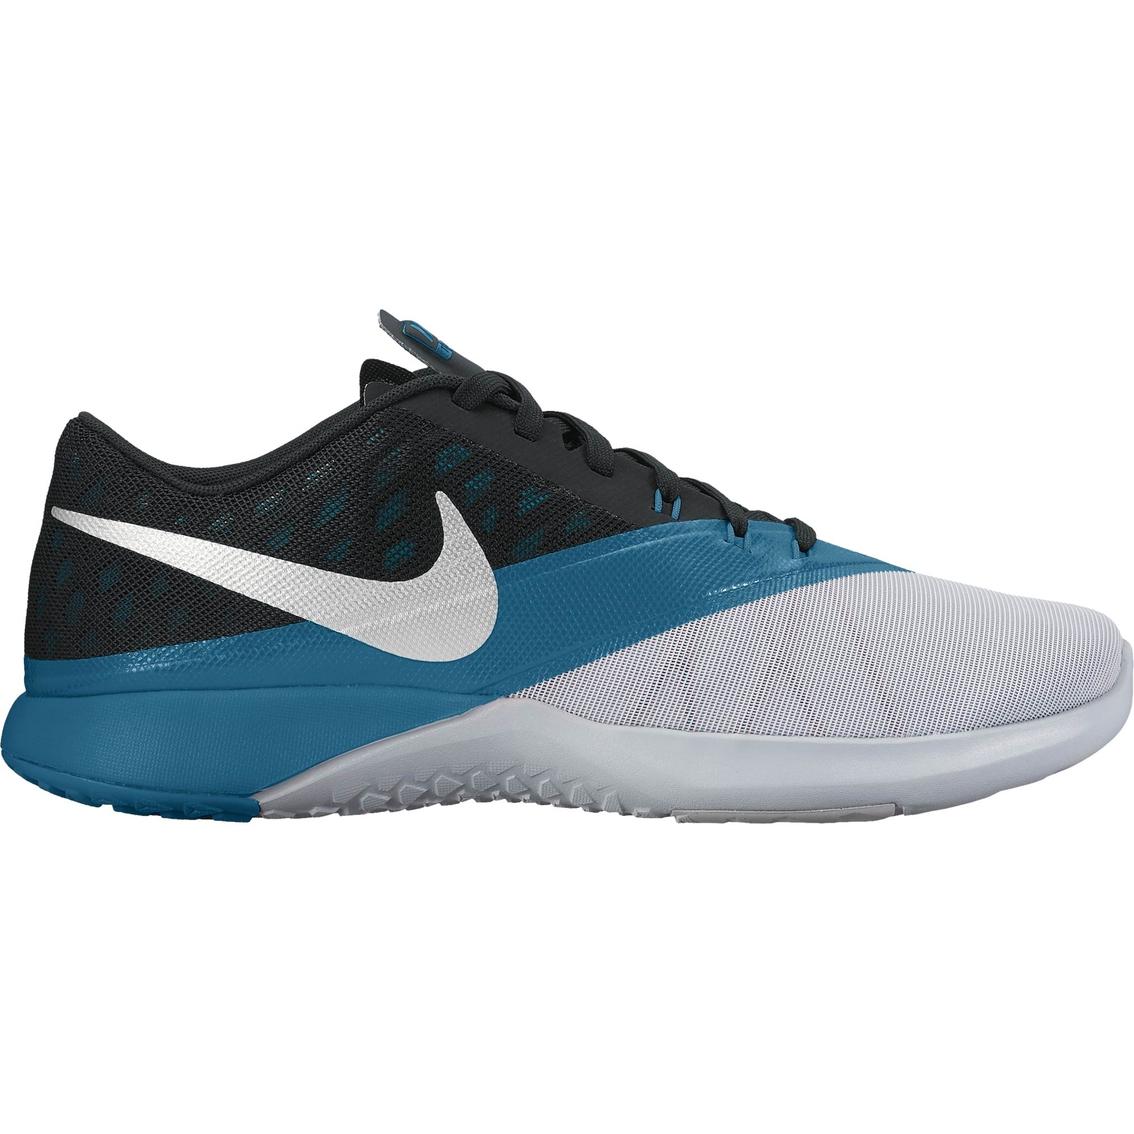 53bb7547acaa Nike Men s Fs Lite Trainer 4 Training Shoes